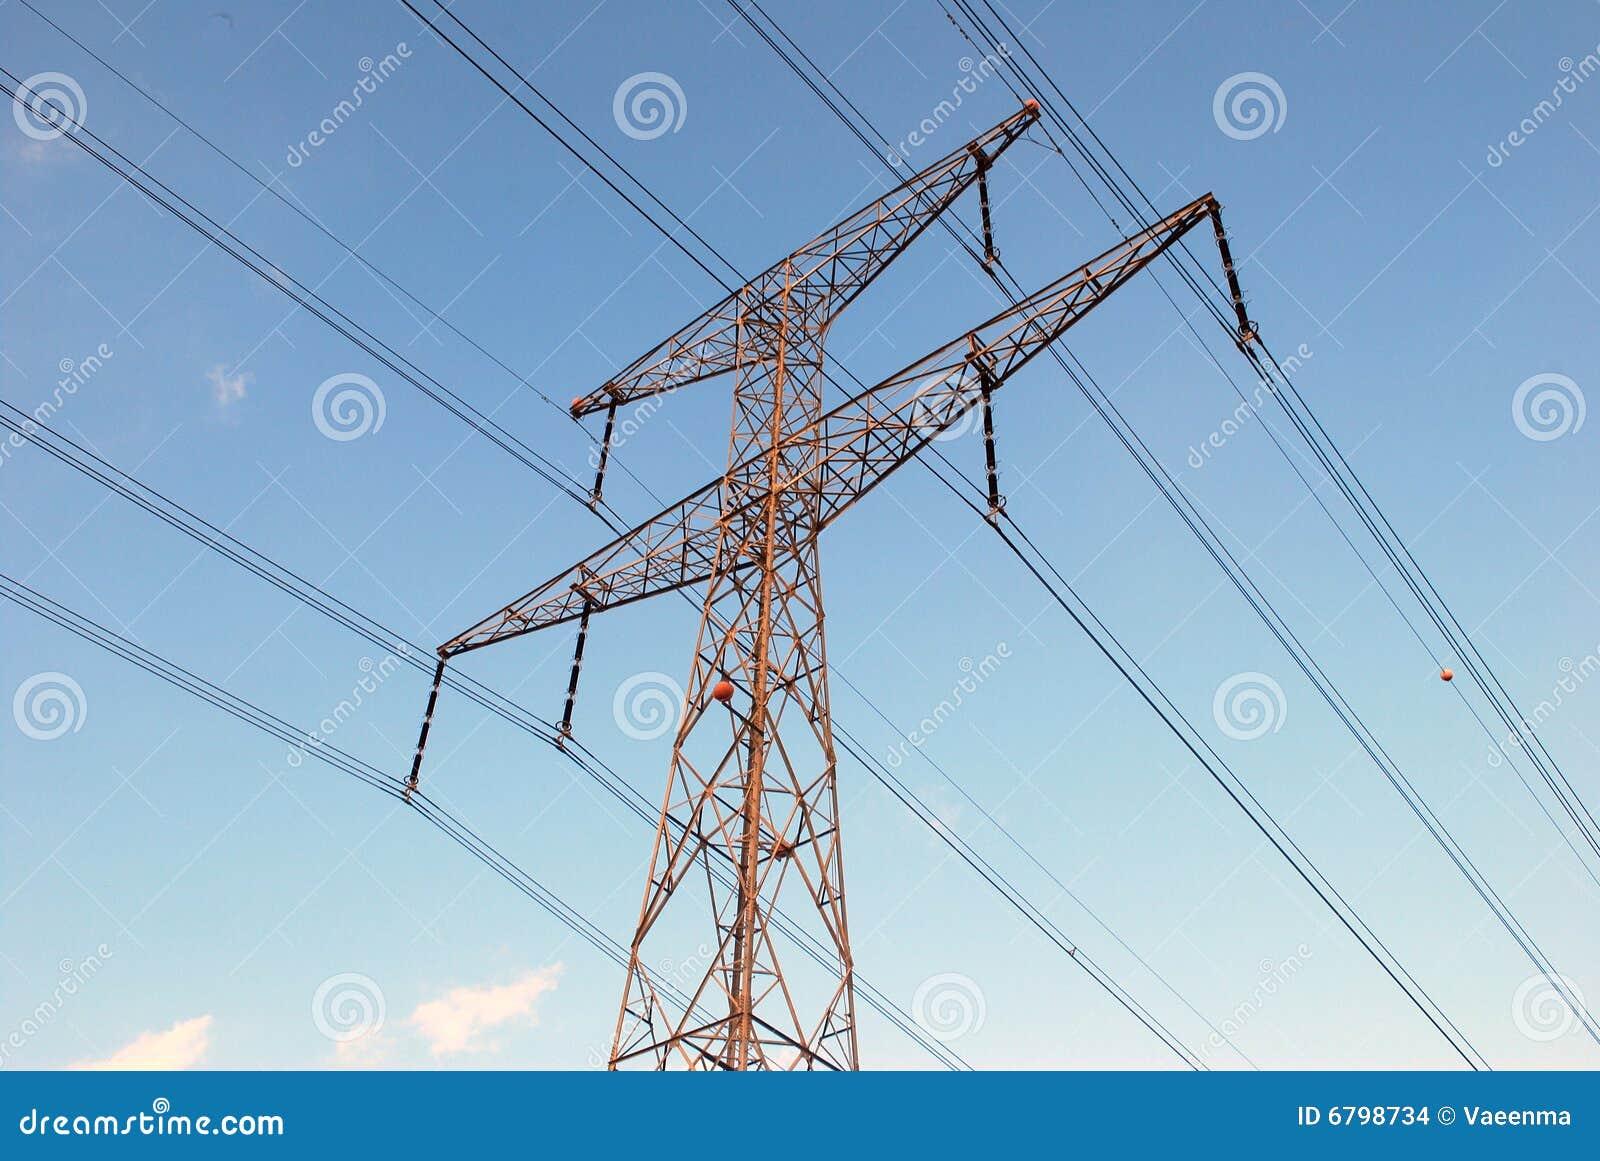 Overhead Power Line : Overhead power line stock images image